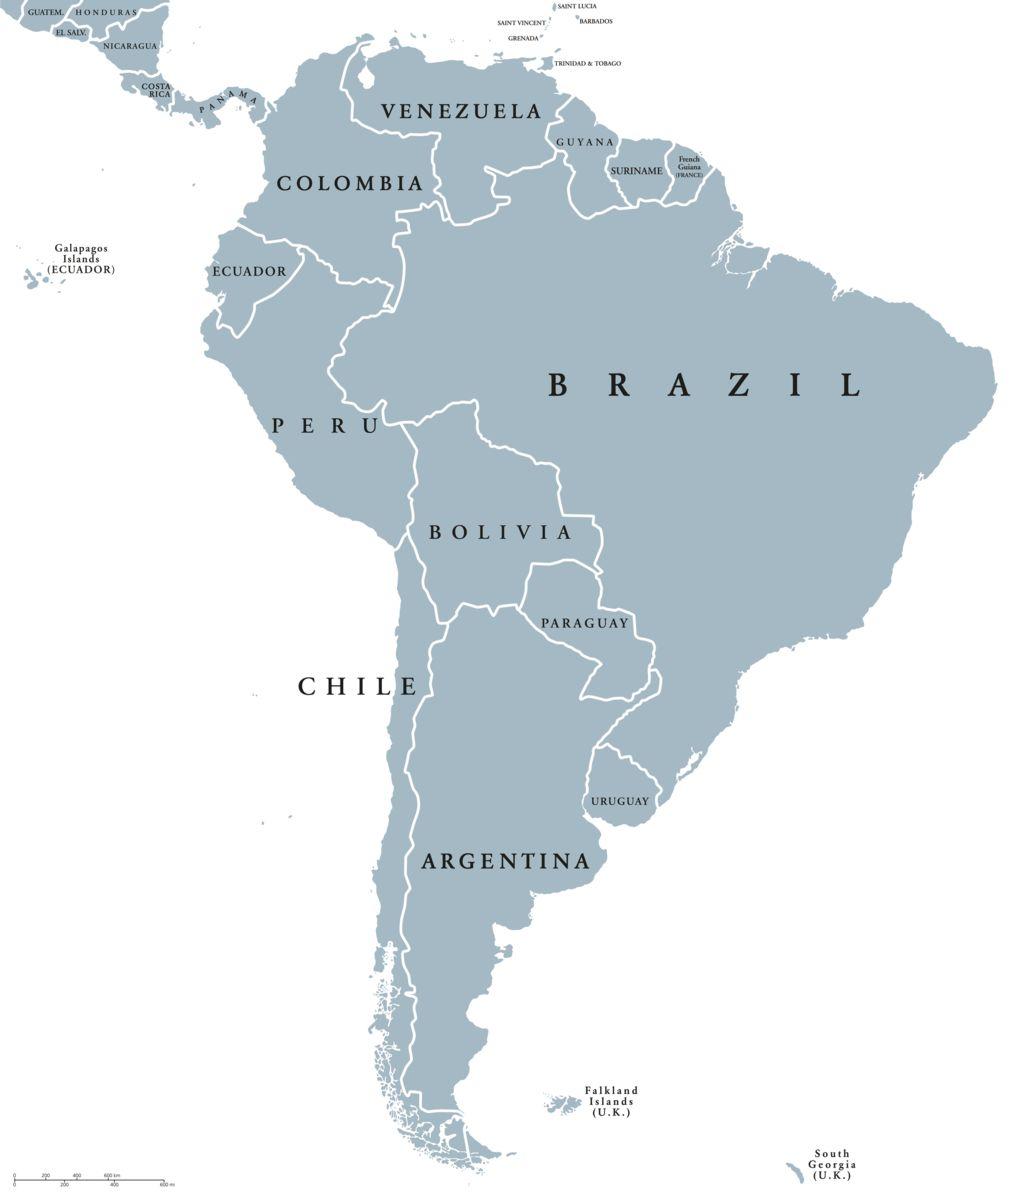 South America Map Galapagos Islands.South America Holidays Tours Honeymoons Shandon Travel